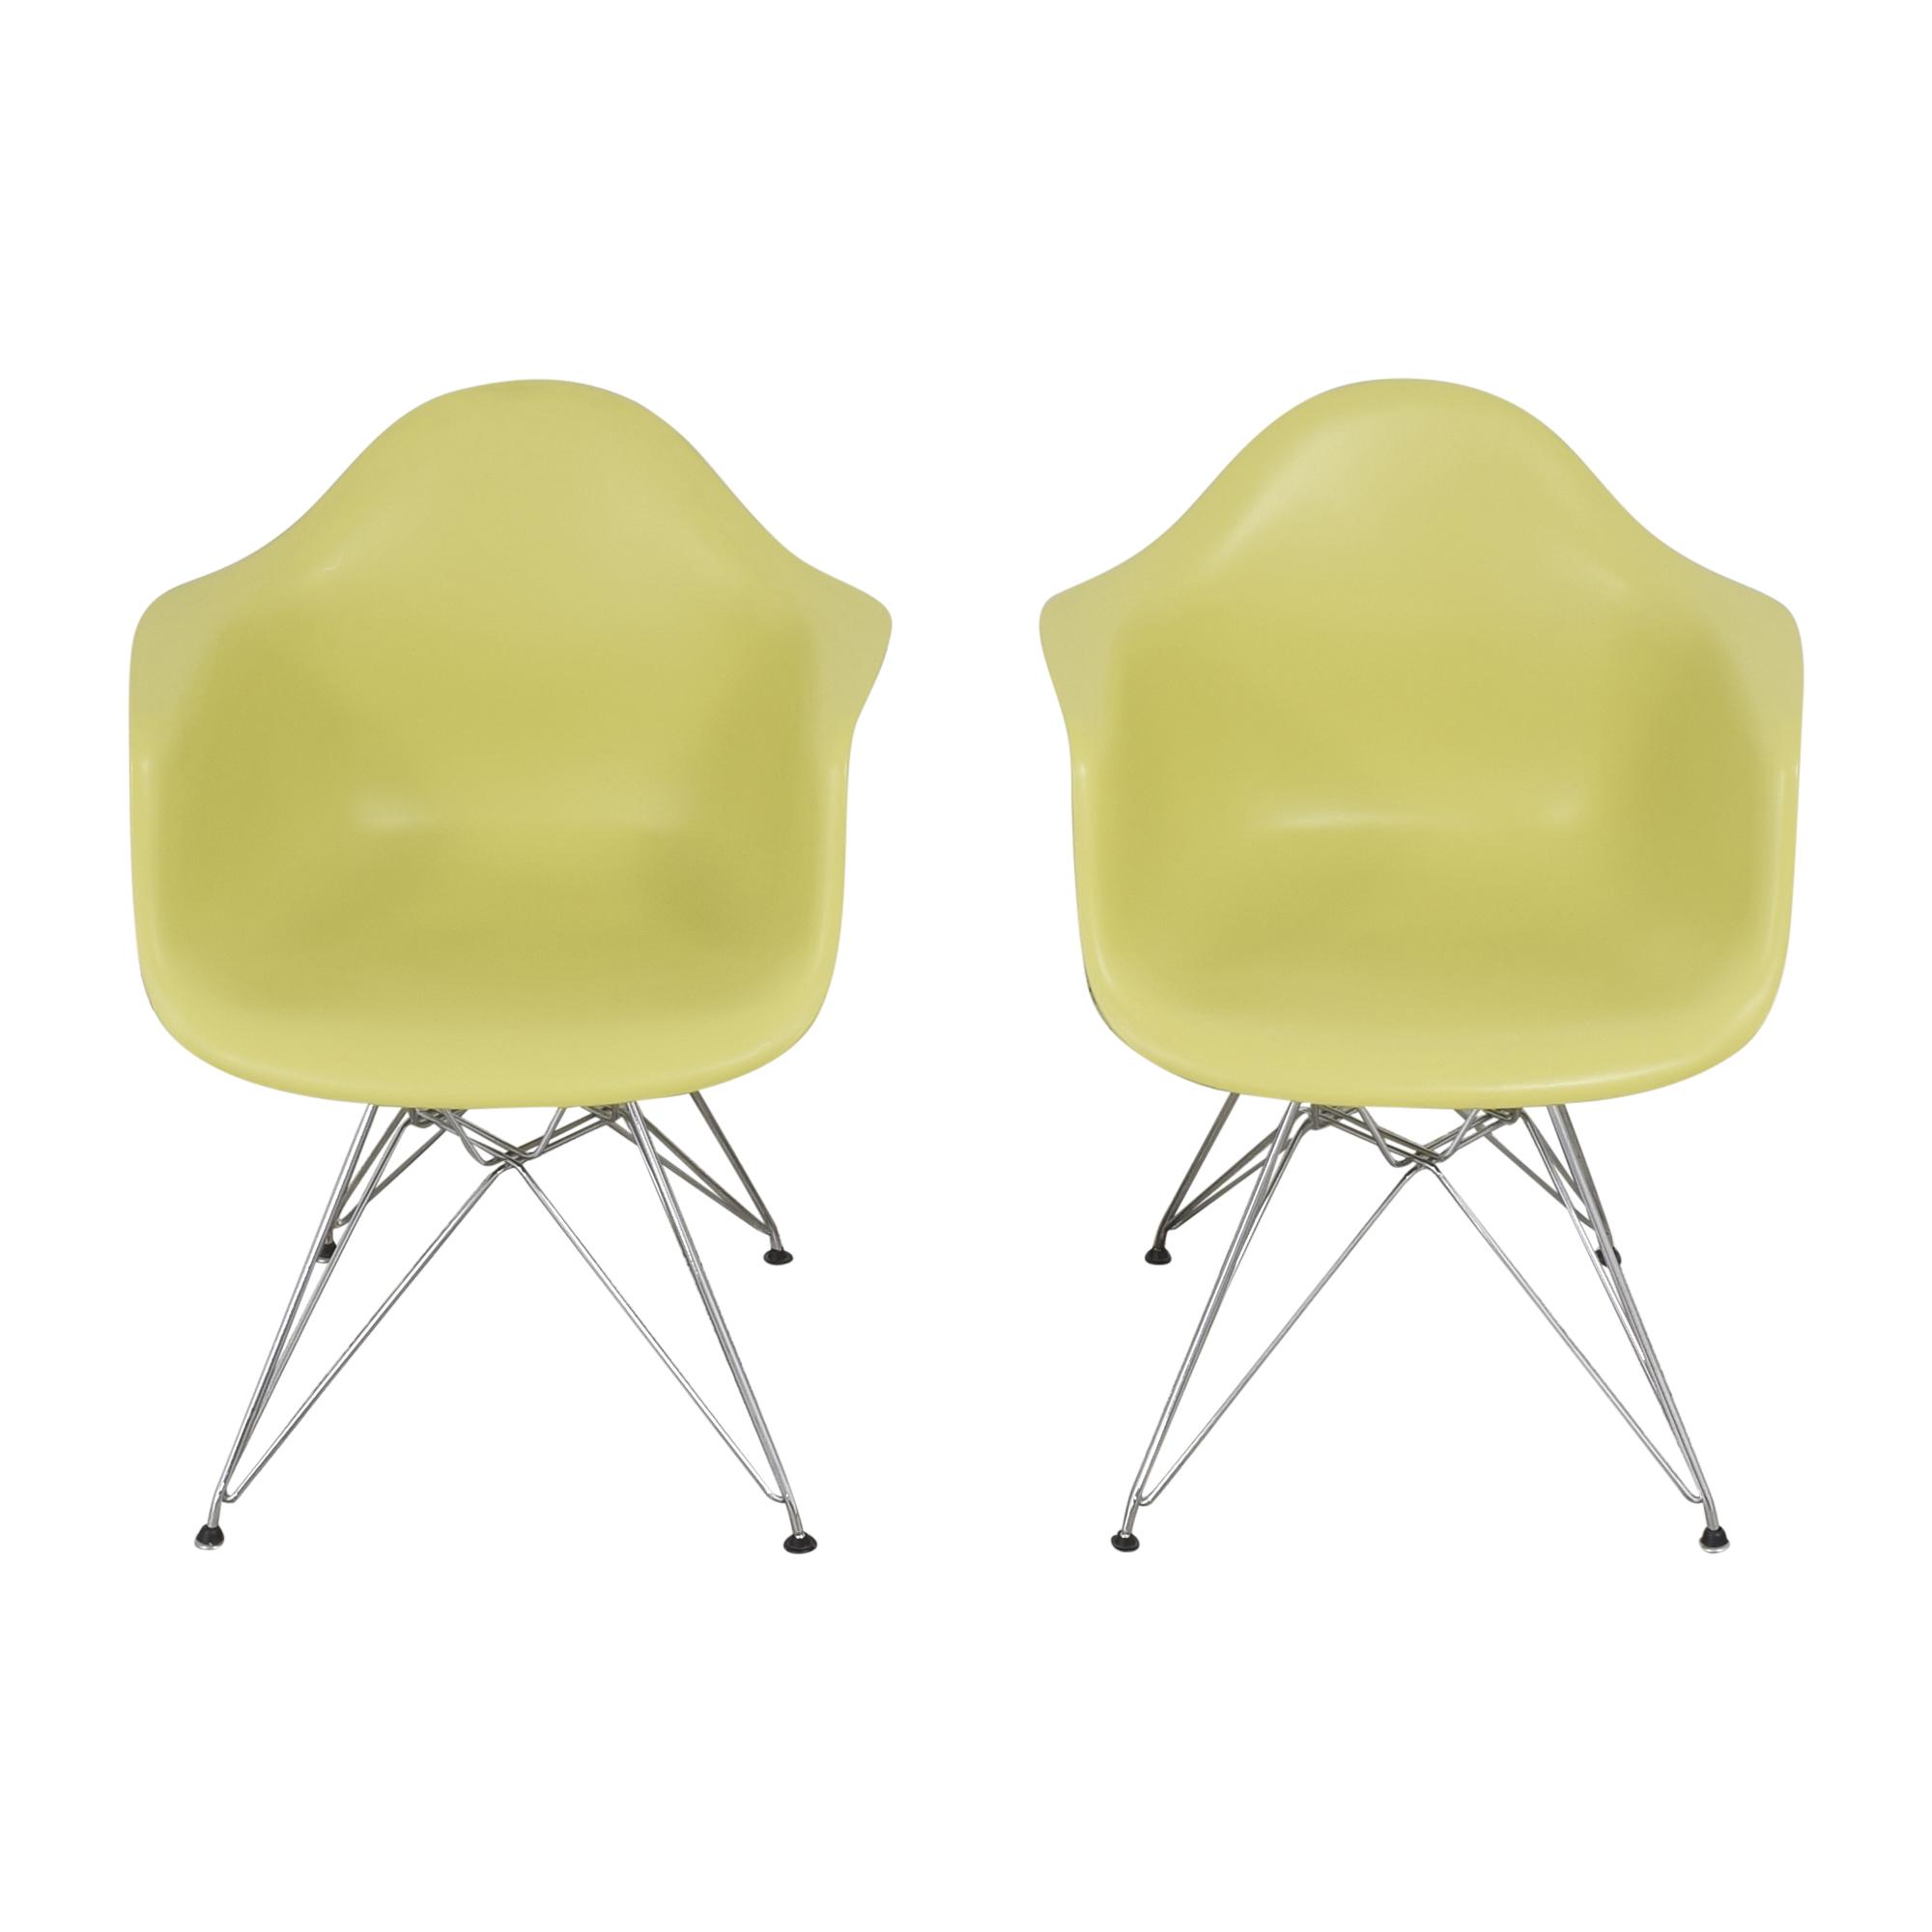 Herman Miller Herman Miller Eames Molded Armchairs dimensions